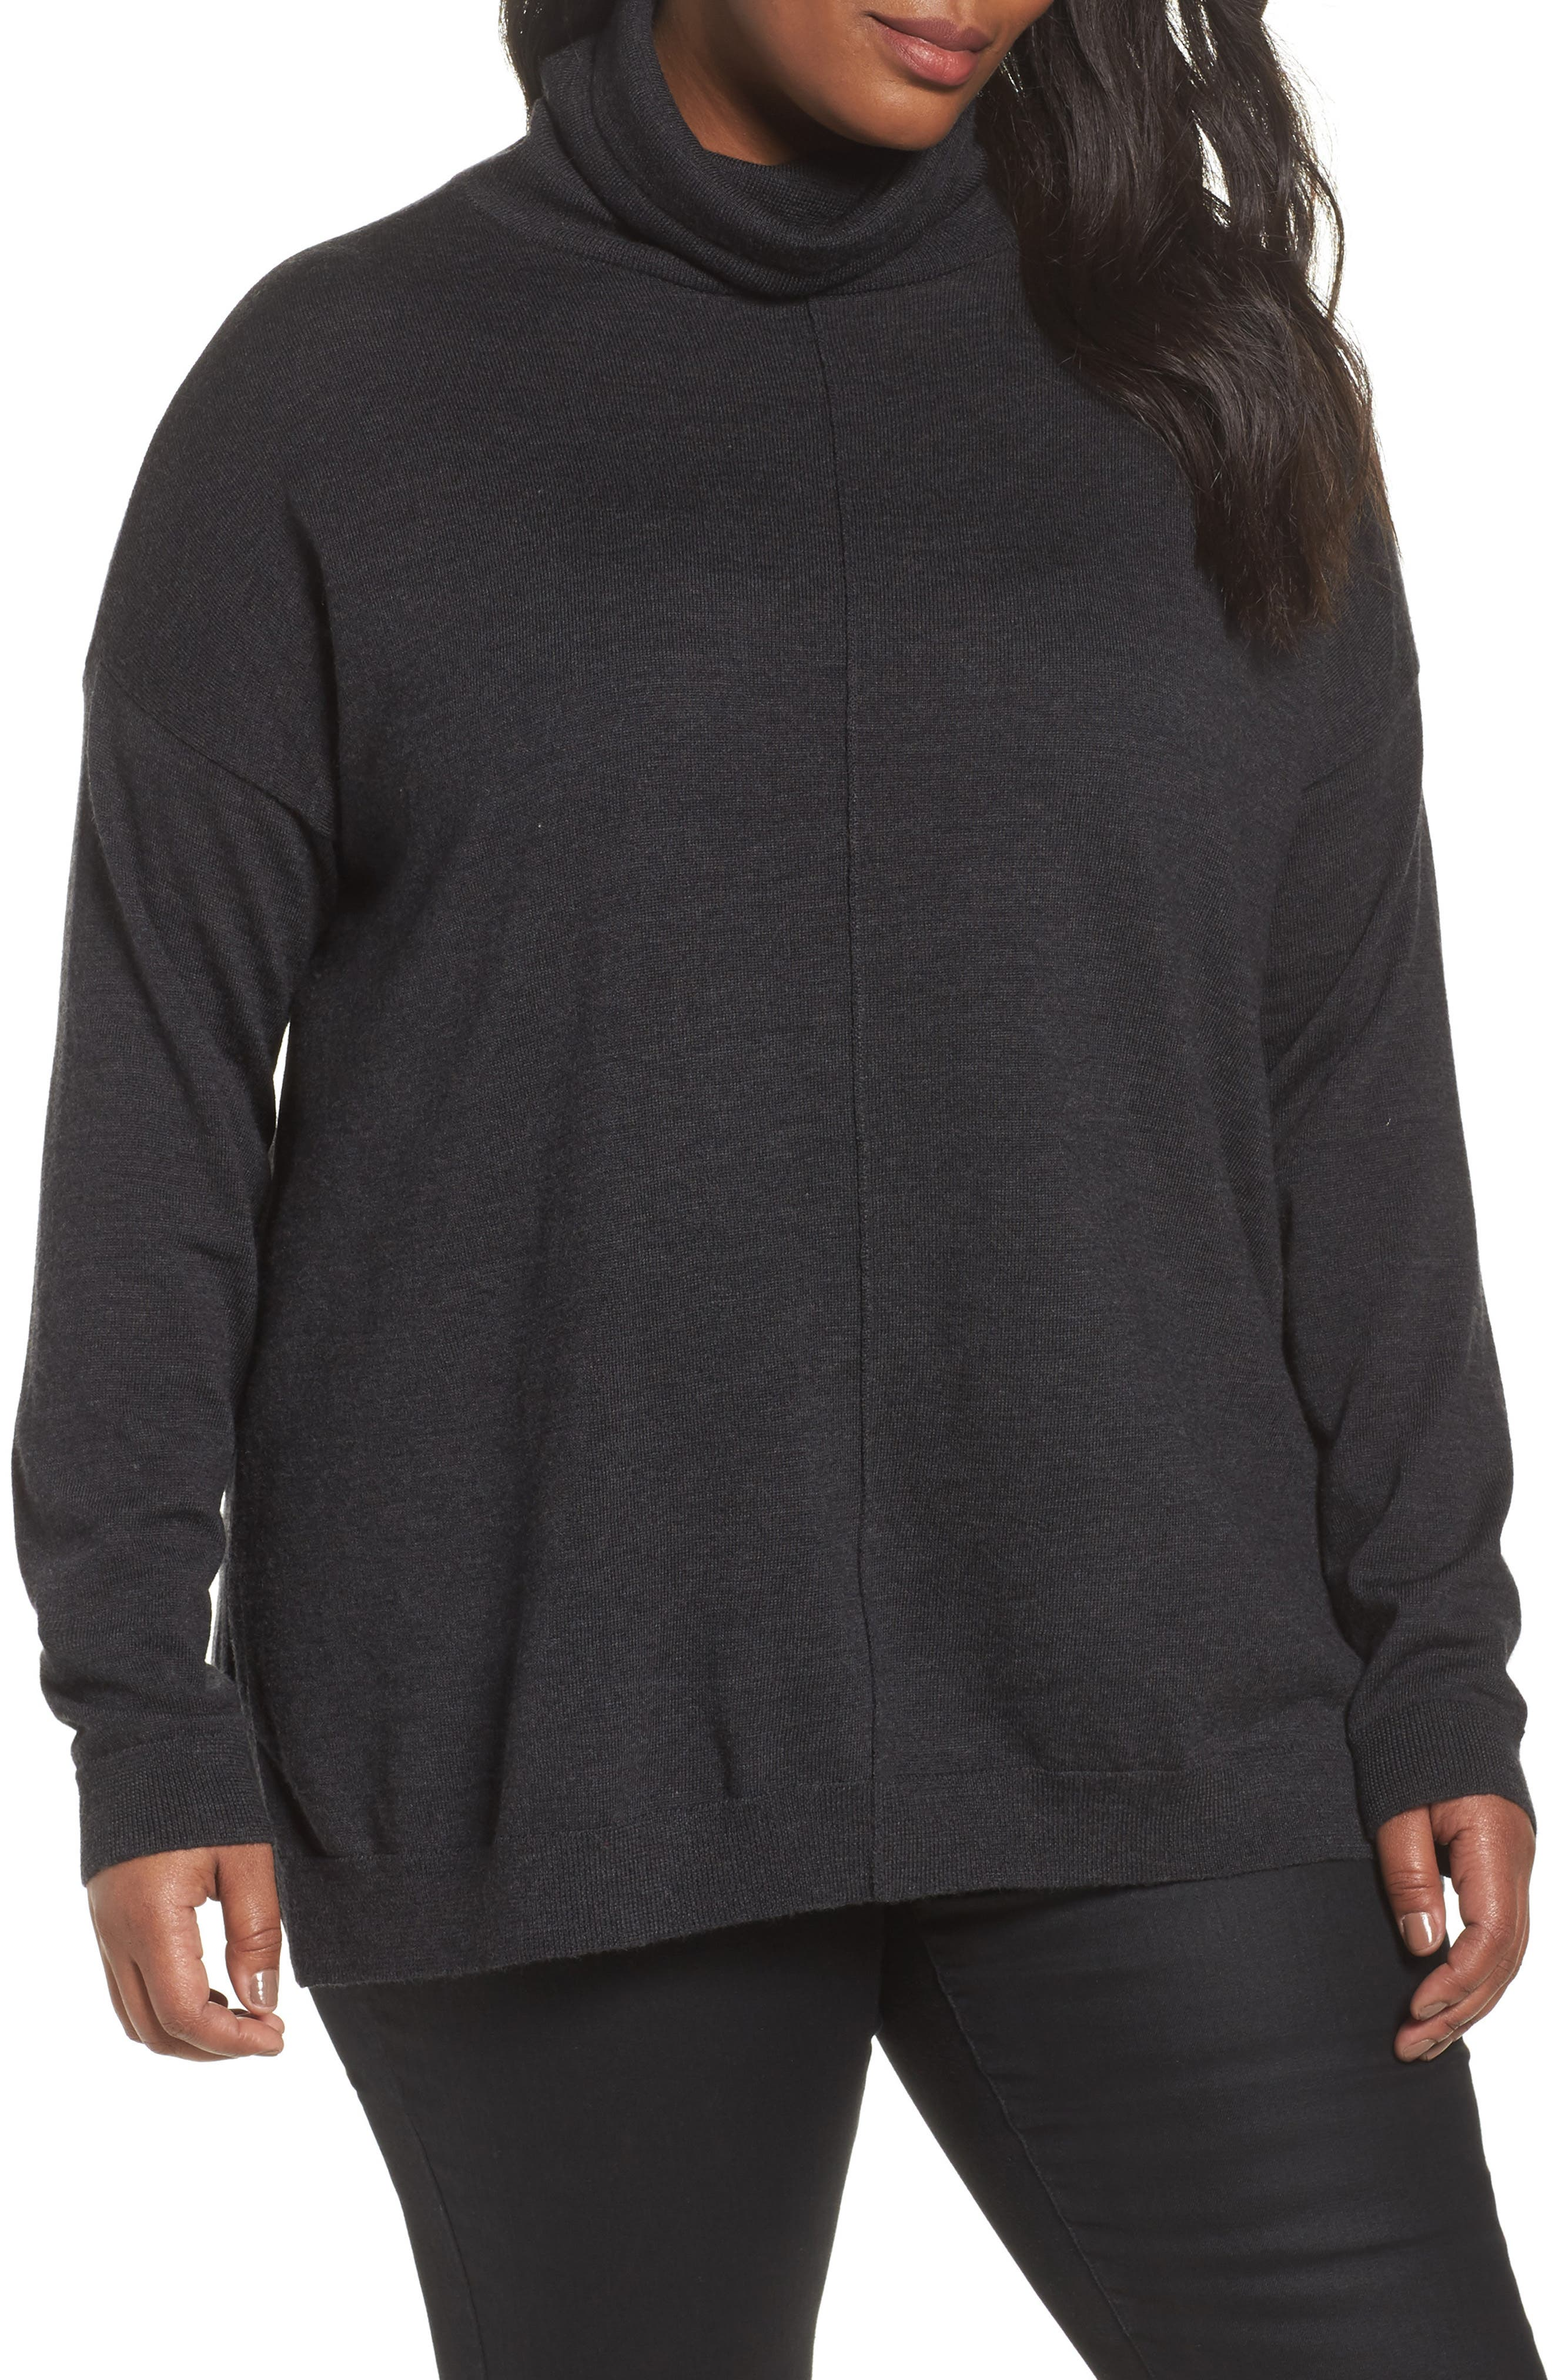 Merino Wool Turtleneck Sweater,                         Main,                         color, Charcoal